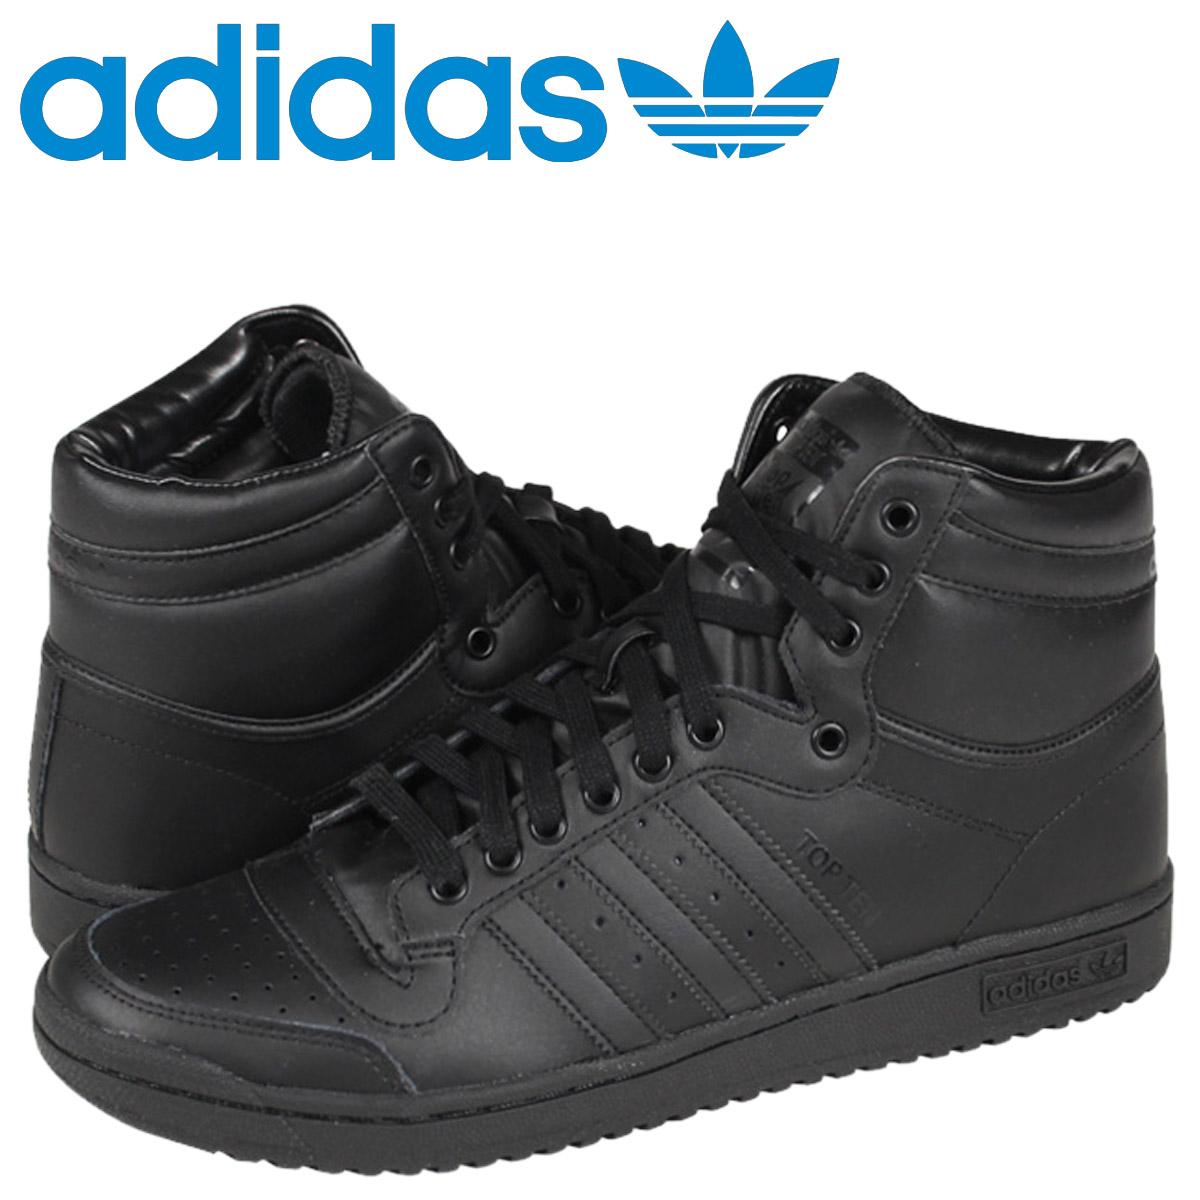 6ce47331232441 Sugar Online Shop  Point 2 x adidas originals adidas Originals TOP ...